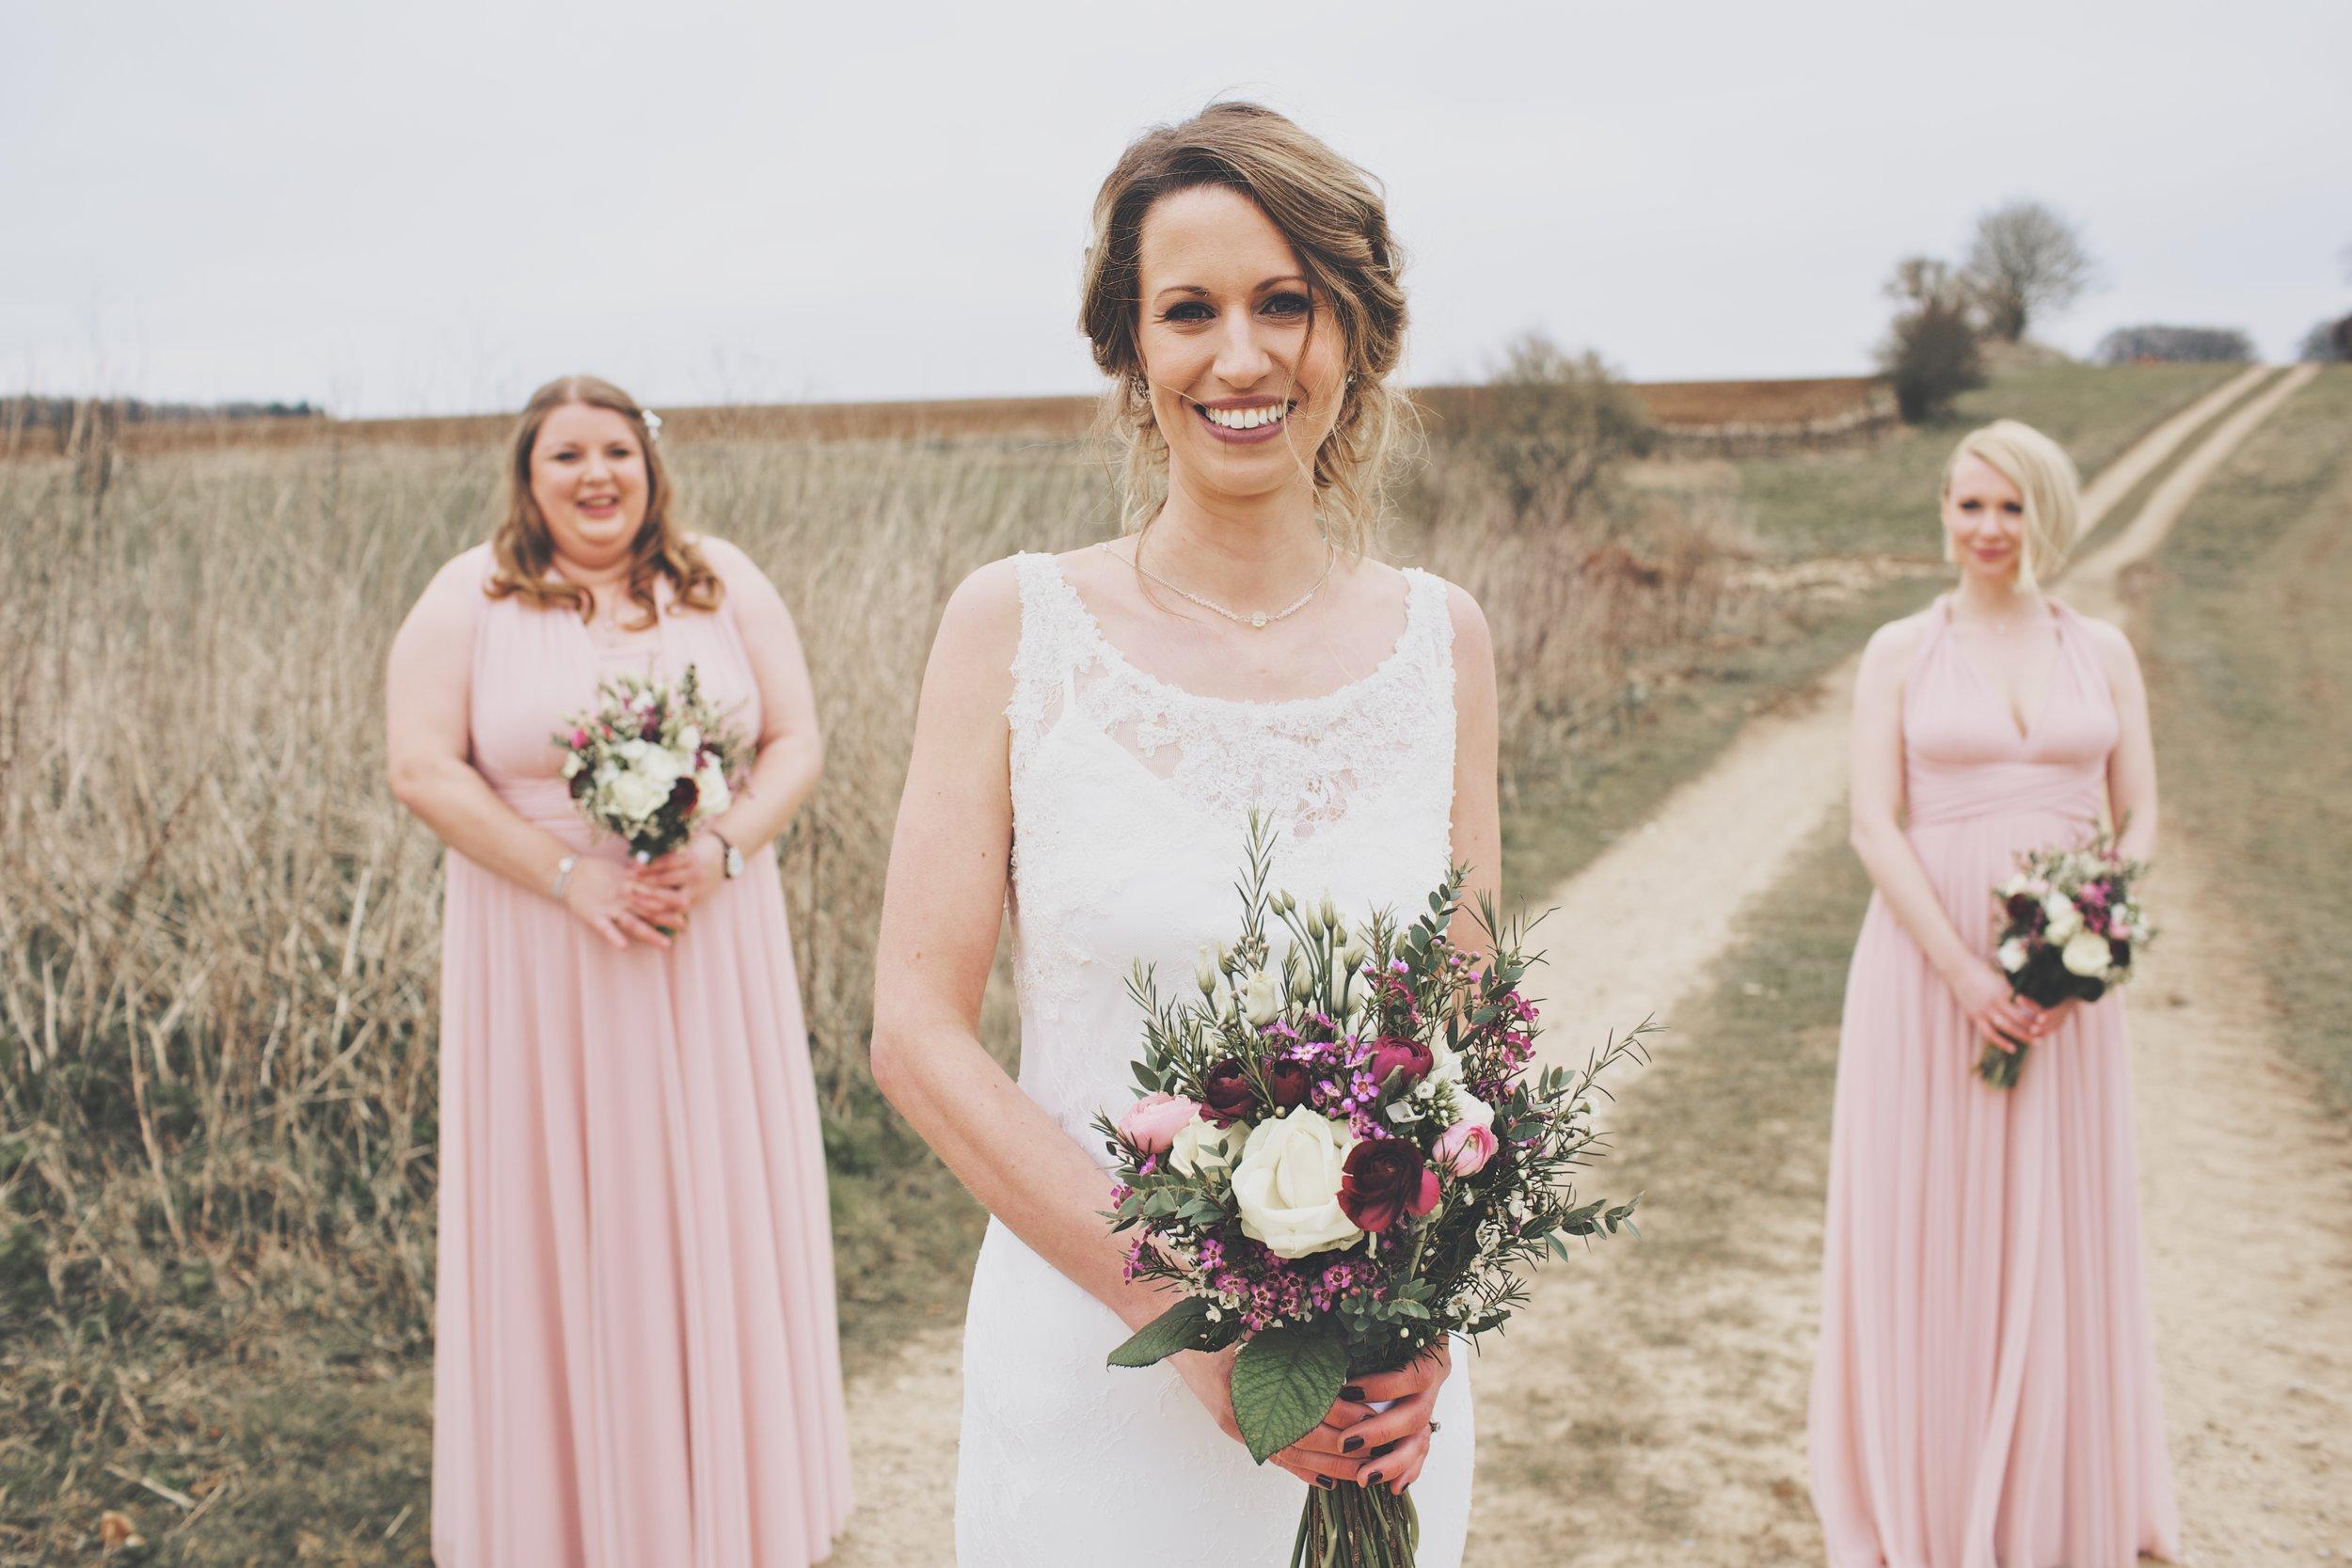 Kate - Bride and bridesmaids